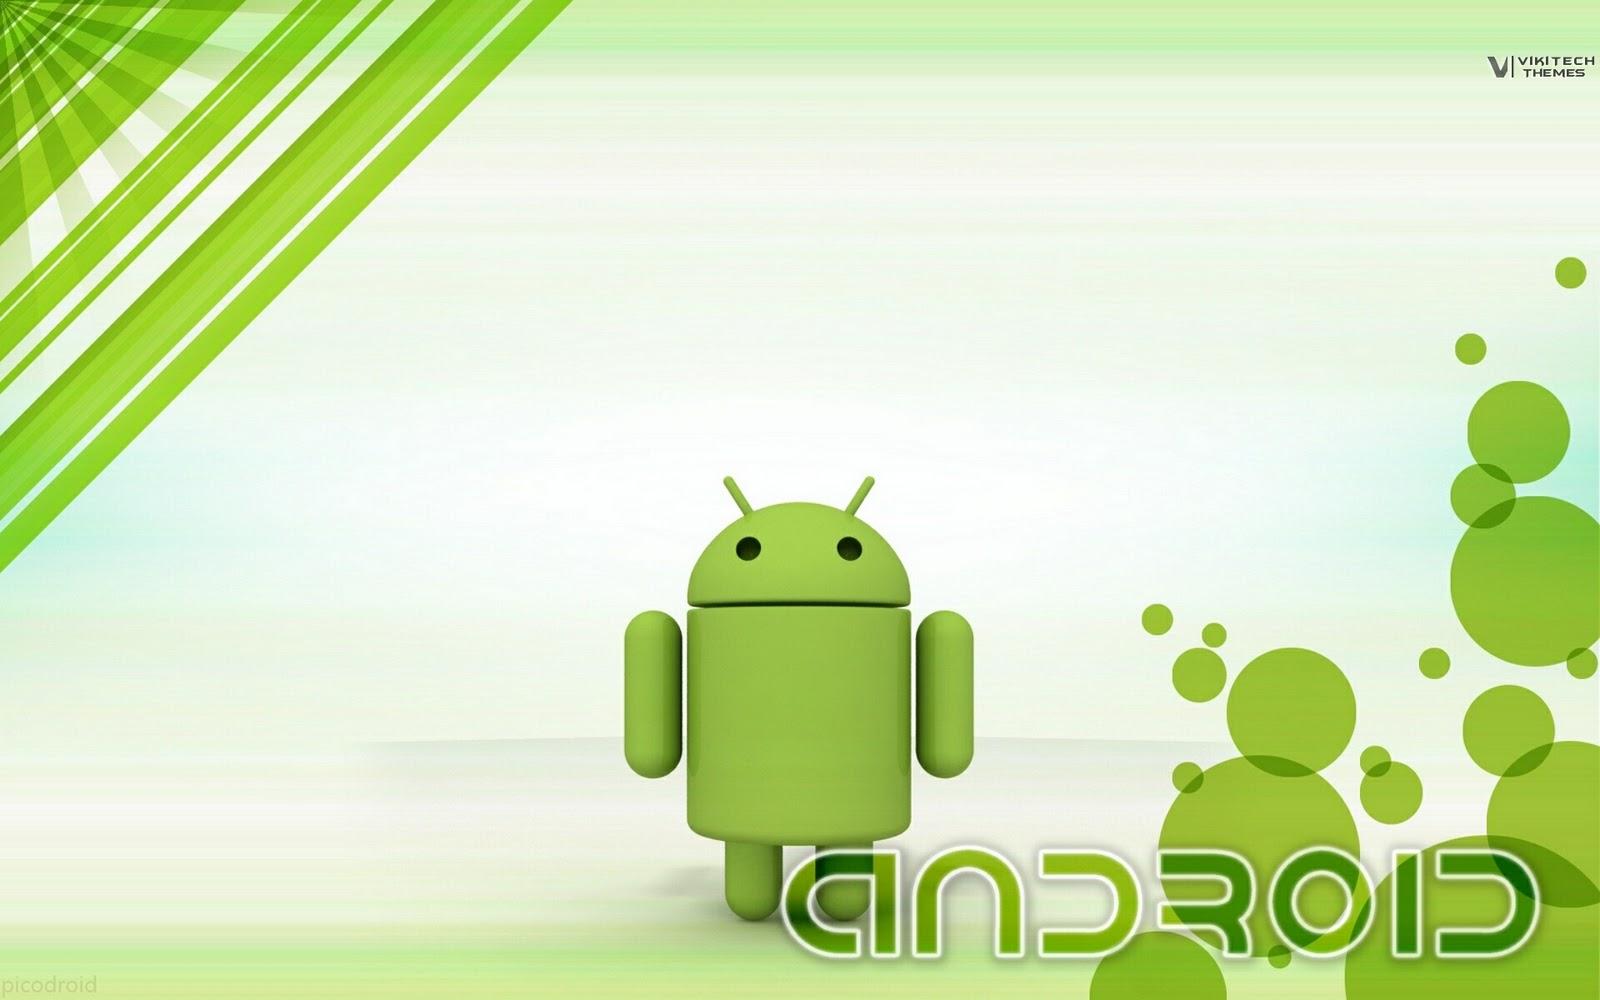 http://2.bp.blogspot.com/_E26Ndy_oKVc/TPlp8pp3MHI/AAAAAAAAAxU/Rq_xq5O8mDk/s1600/Wallpaper+Android+%252810%2529.jpg